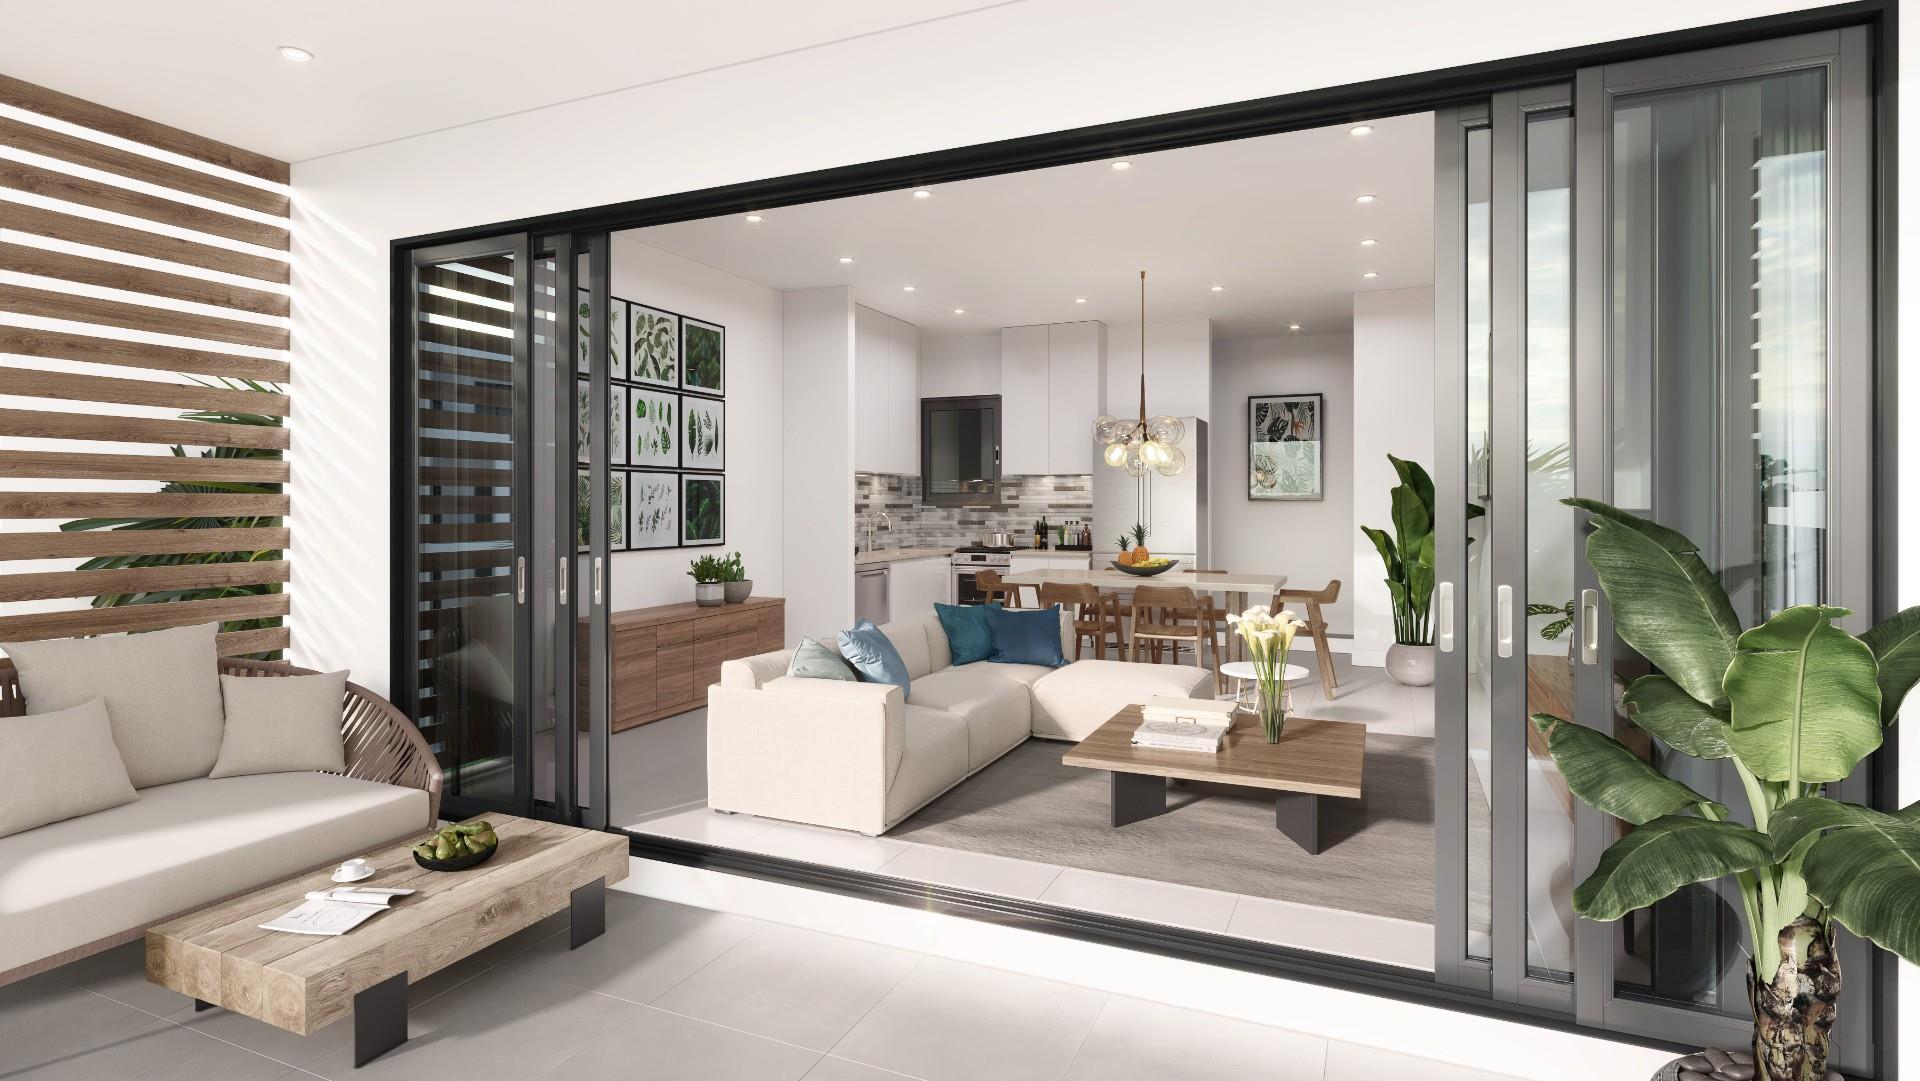 2 Bedroom Apartment / Flat For Sale in Cap Malheureux